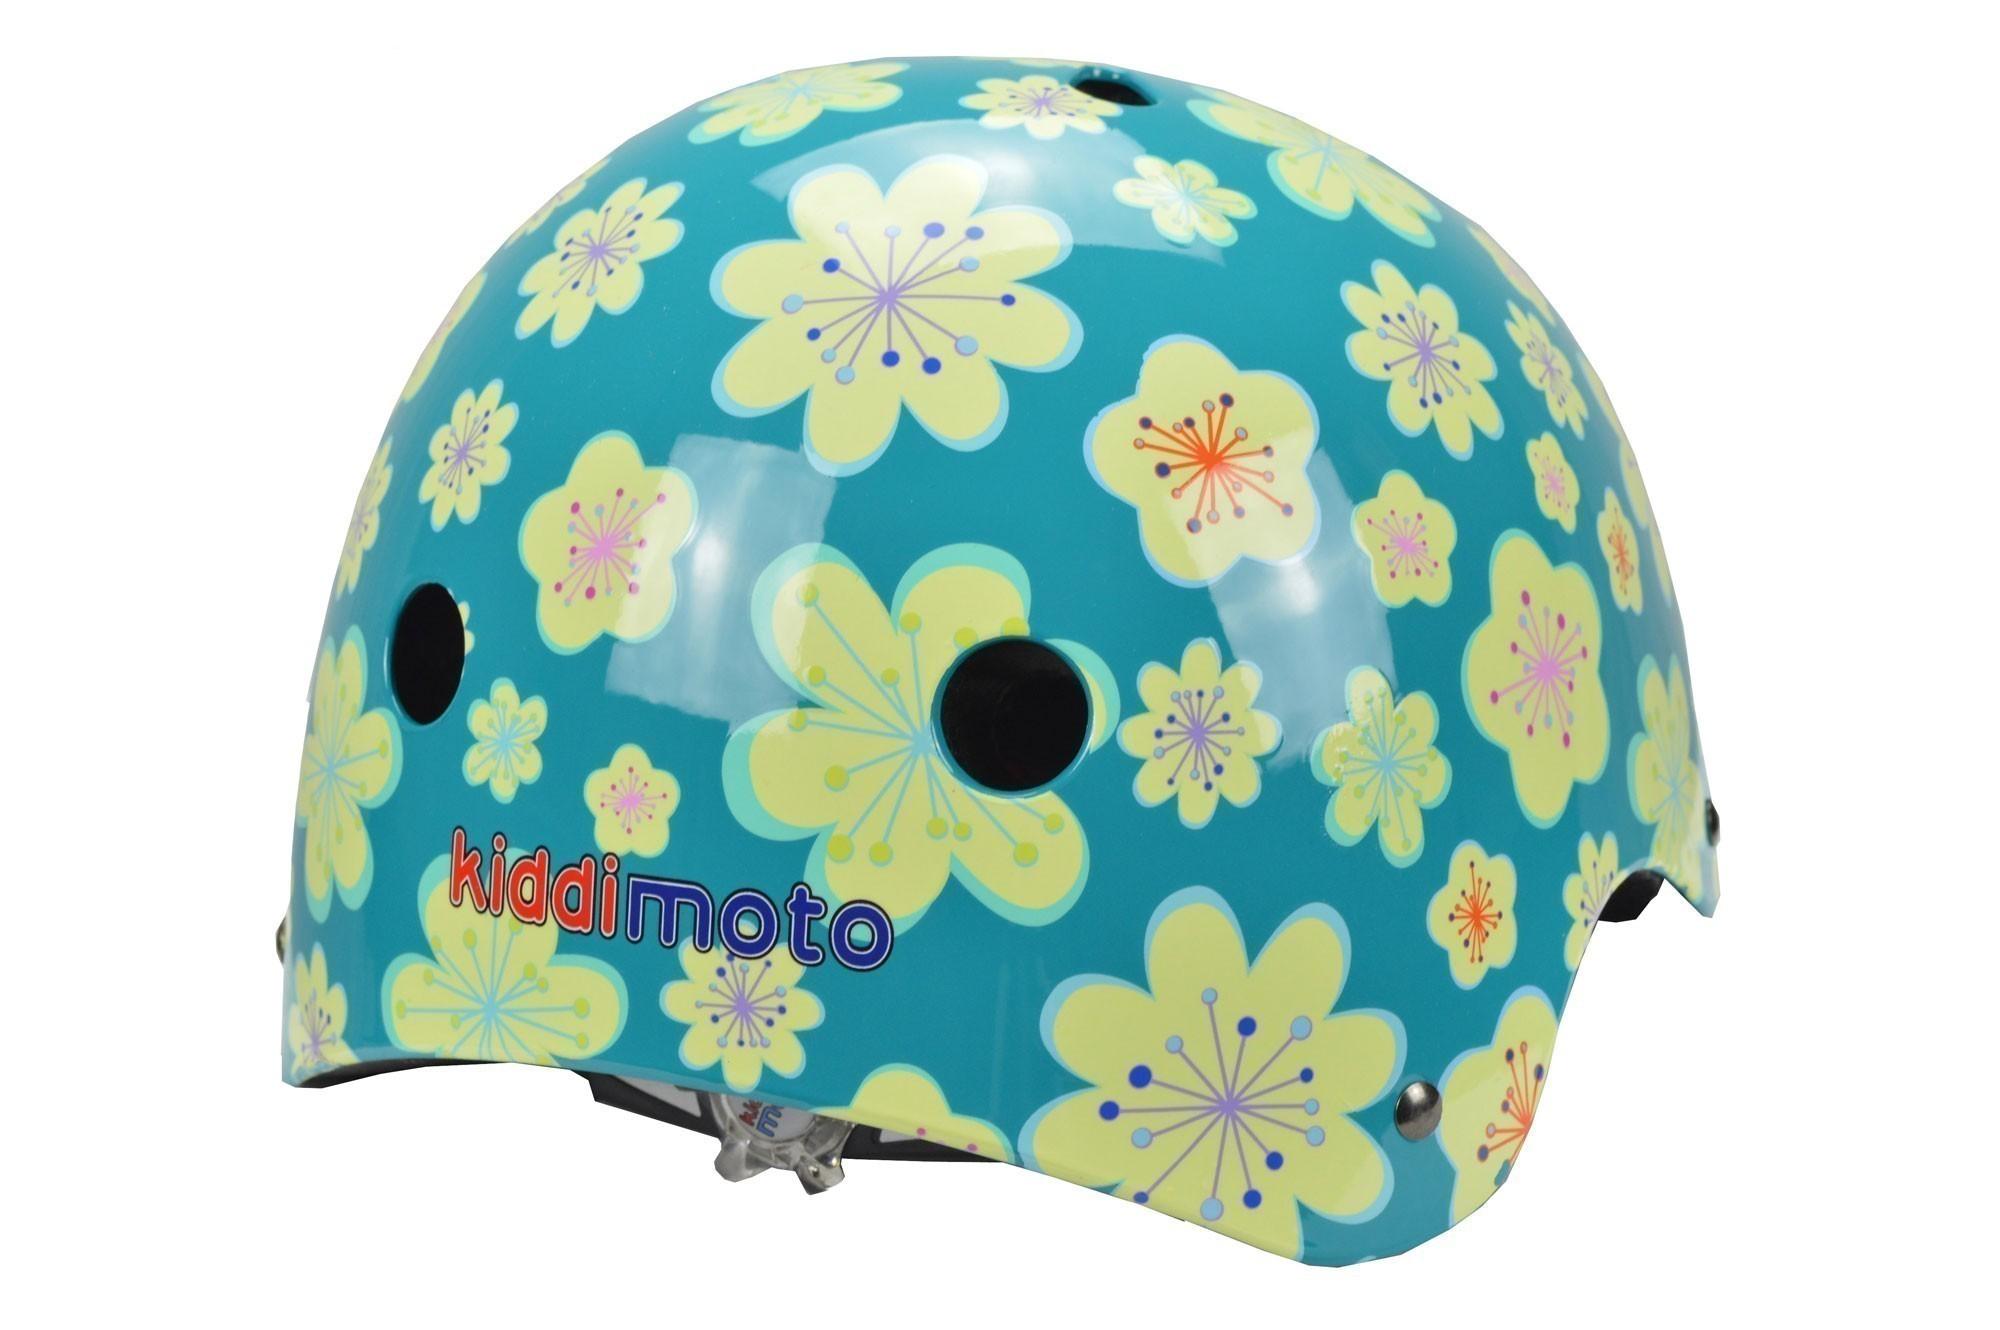 kiddimoto Fahrradhelm / Kinderhelm Größe M Fleur Bild 2